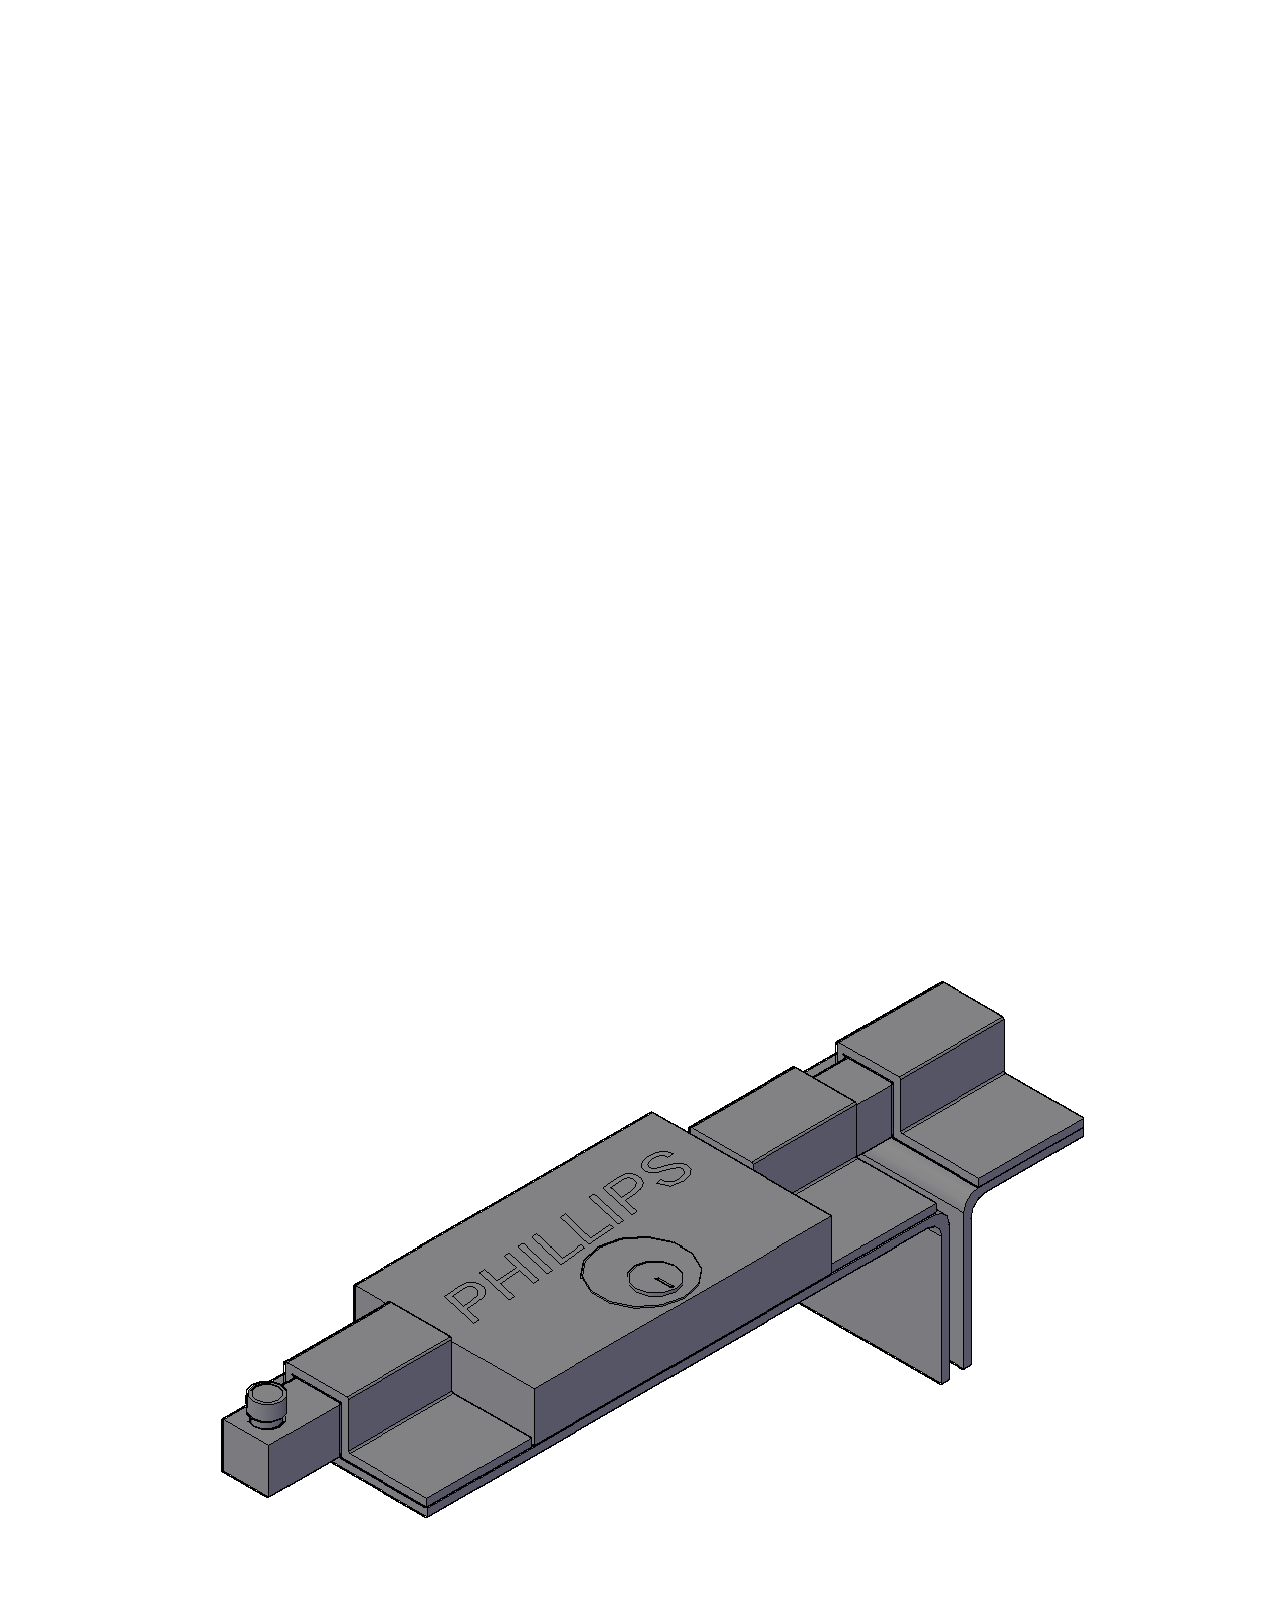 cerradura de barra en 3D marca Phillips